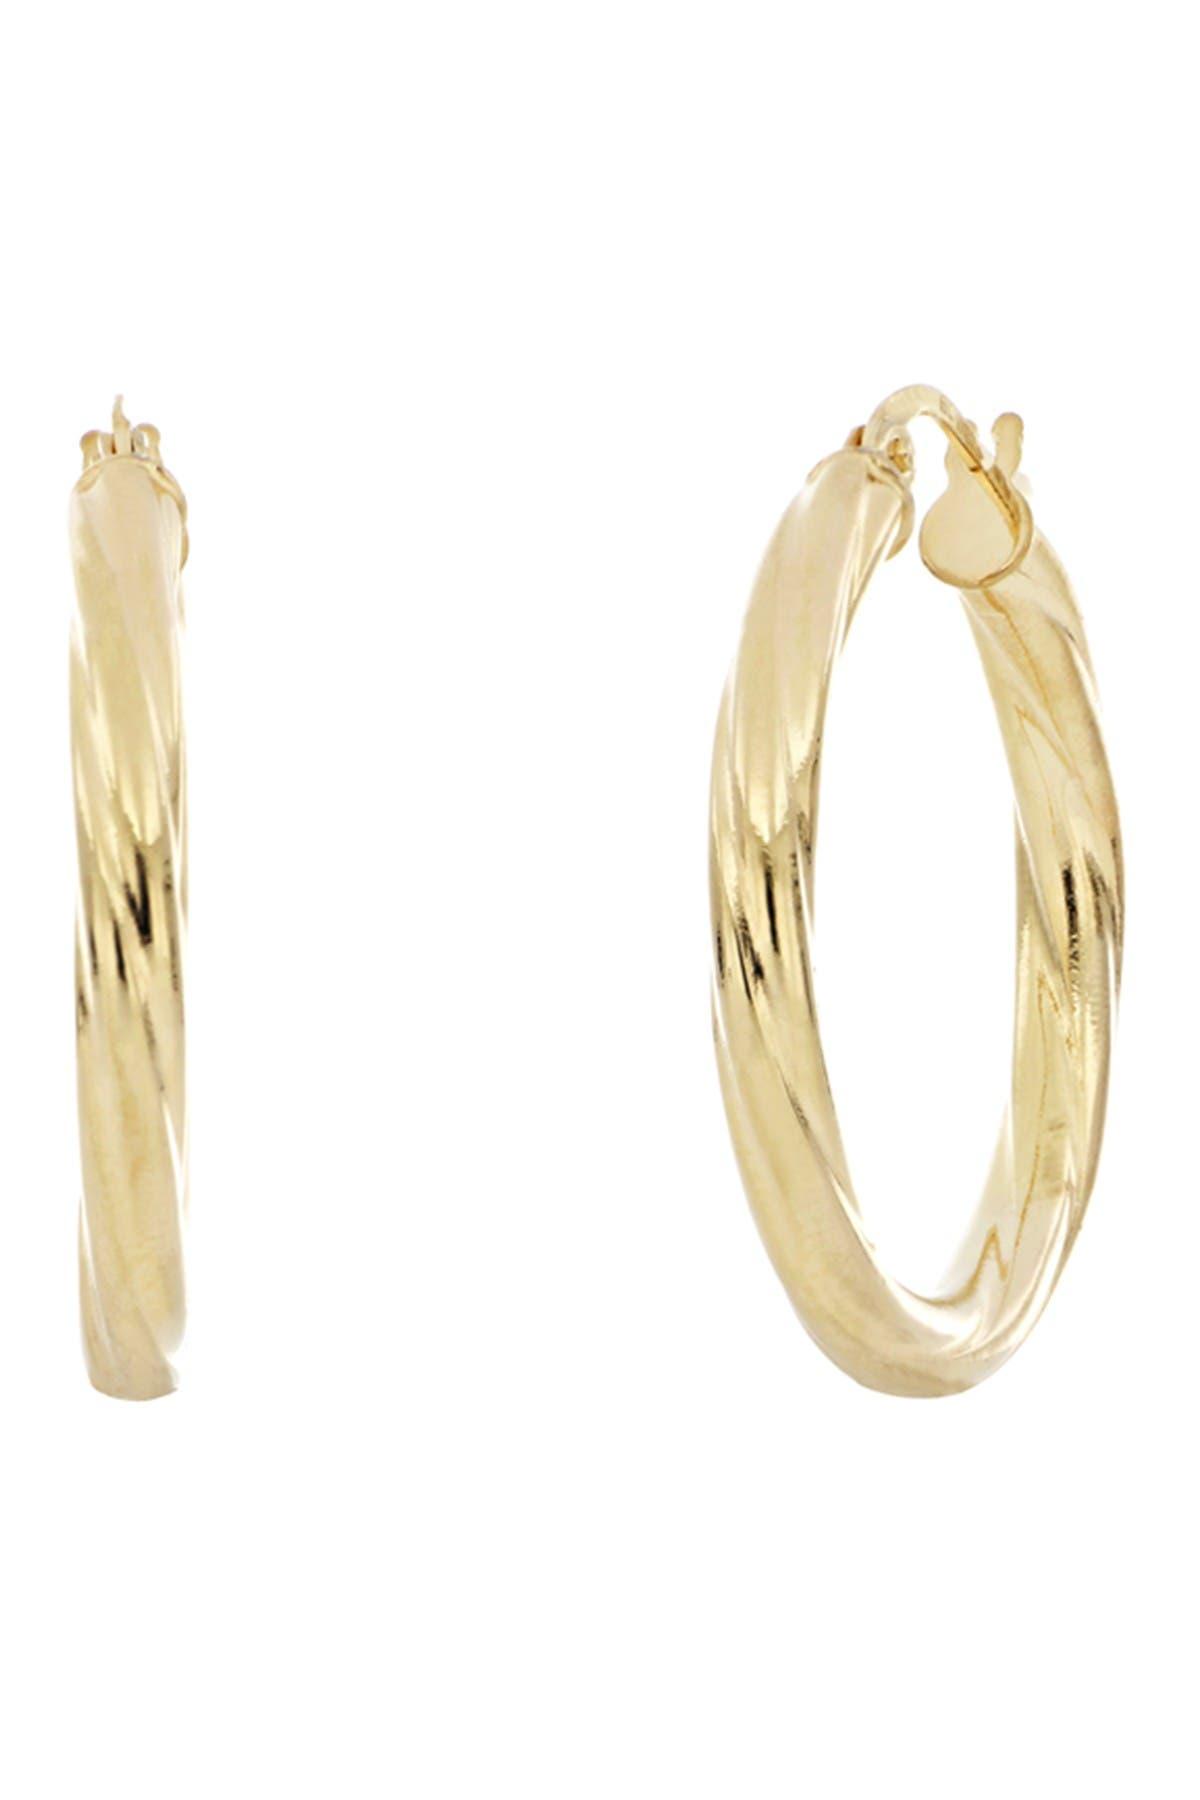 Image of Bony Levy 14K Yellow Gold Polished 26mm Hoop Earrings